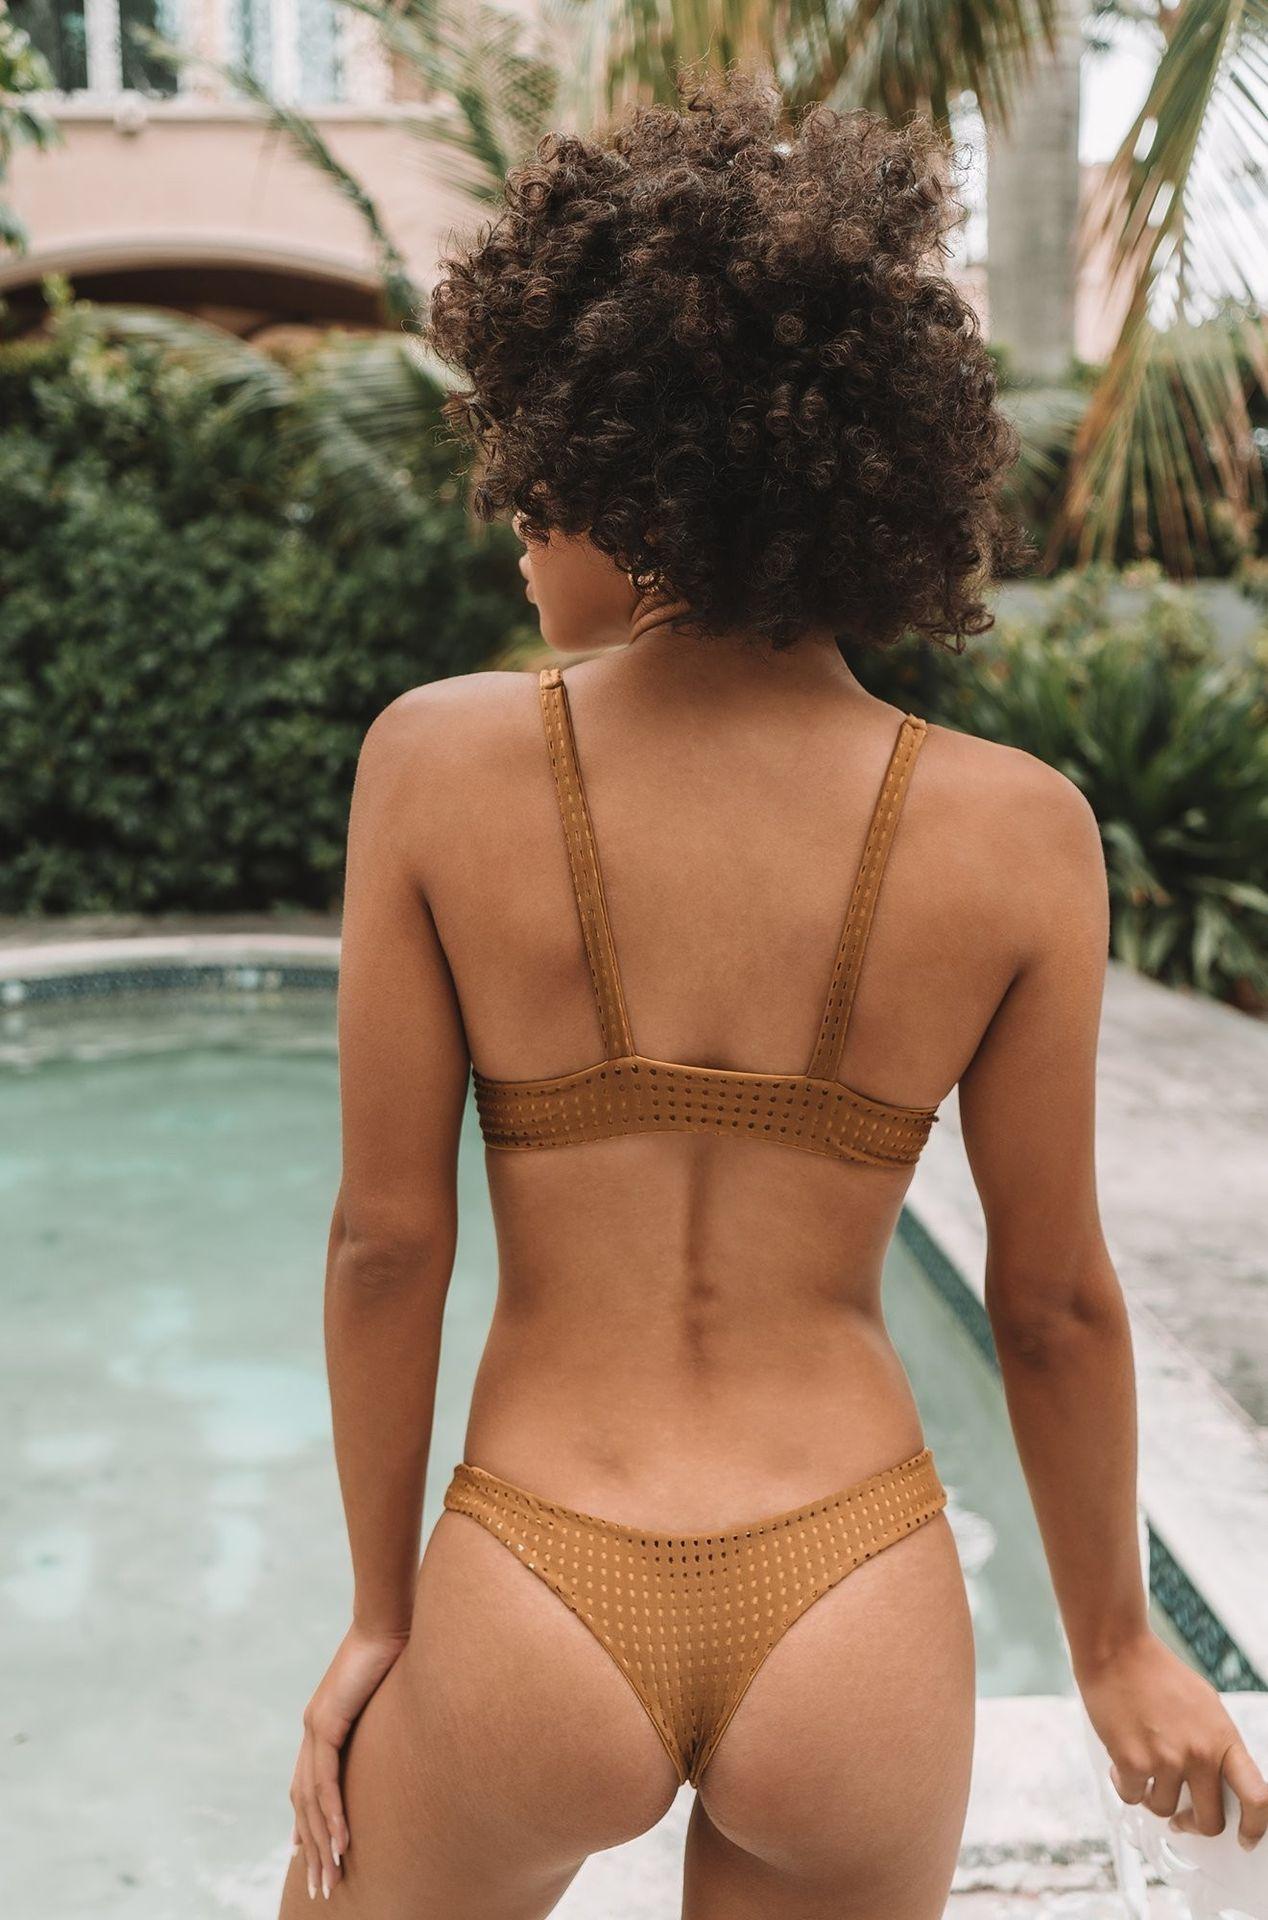 Jamea Lynee Nude & Sexy 0080